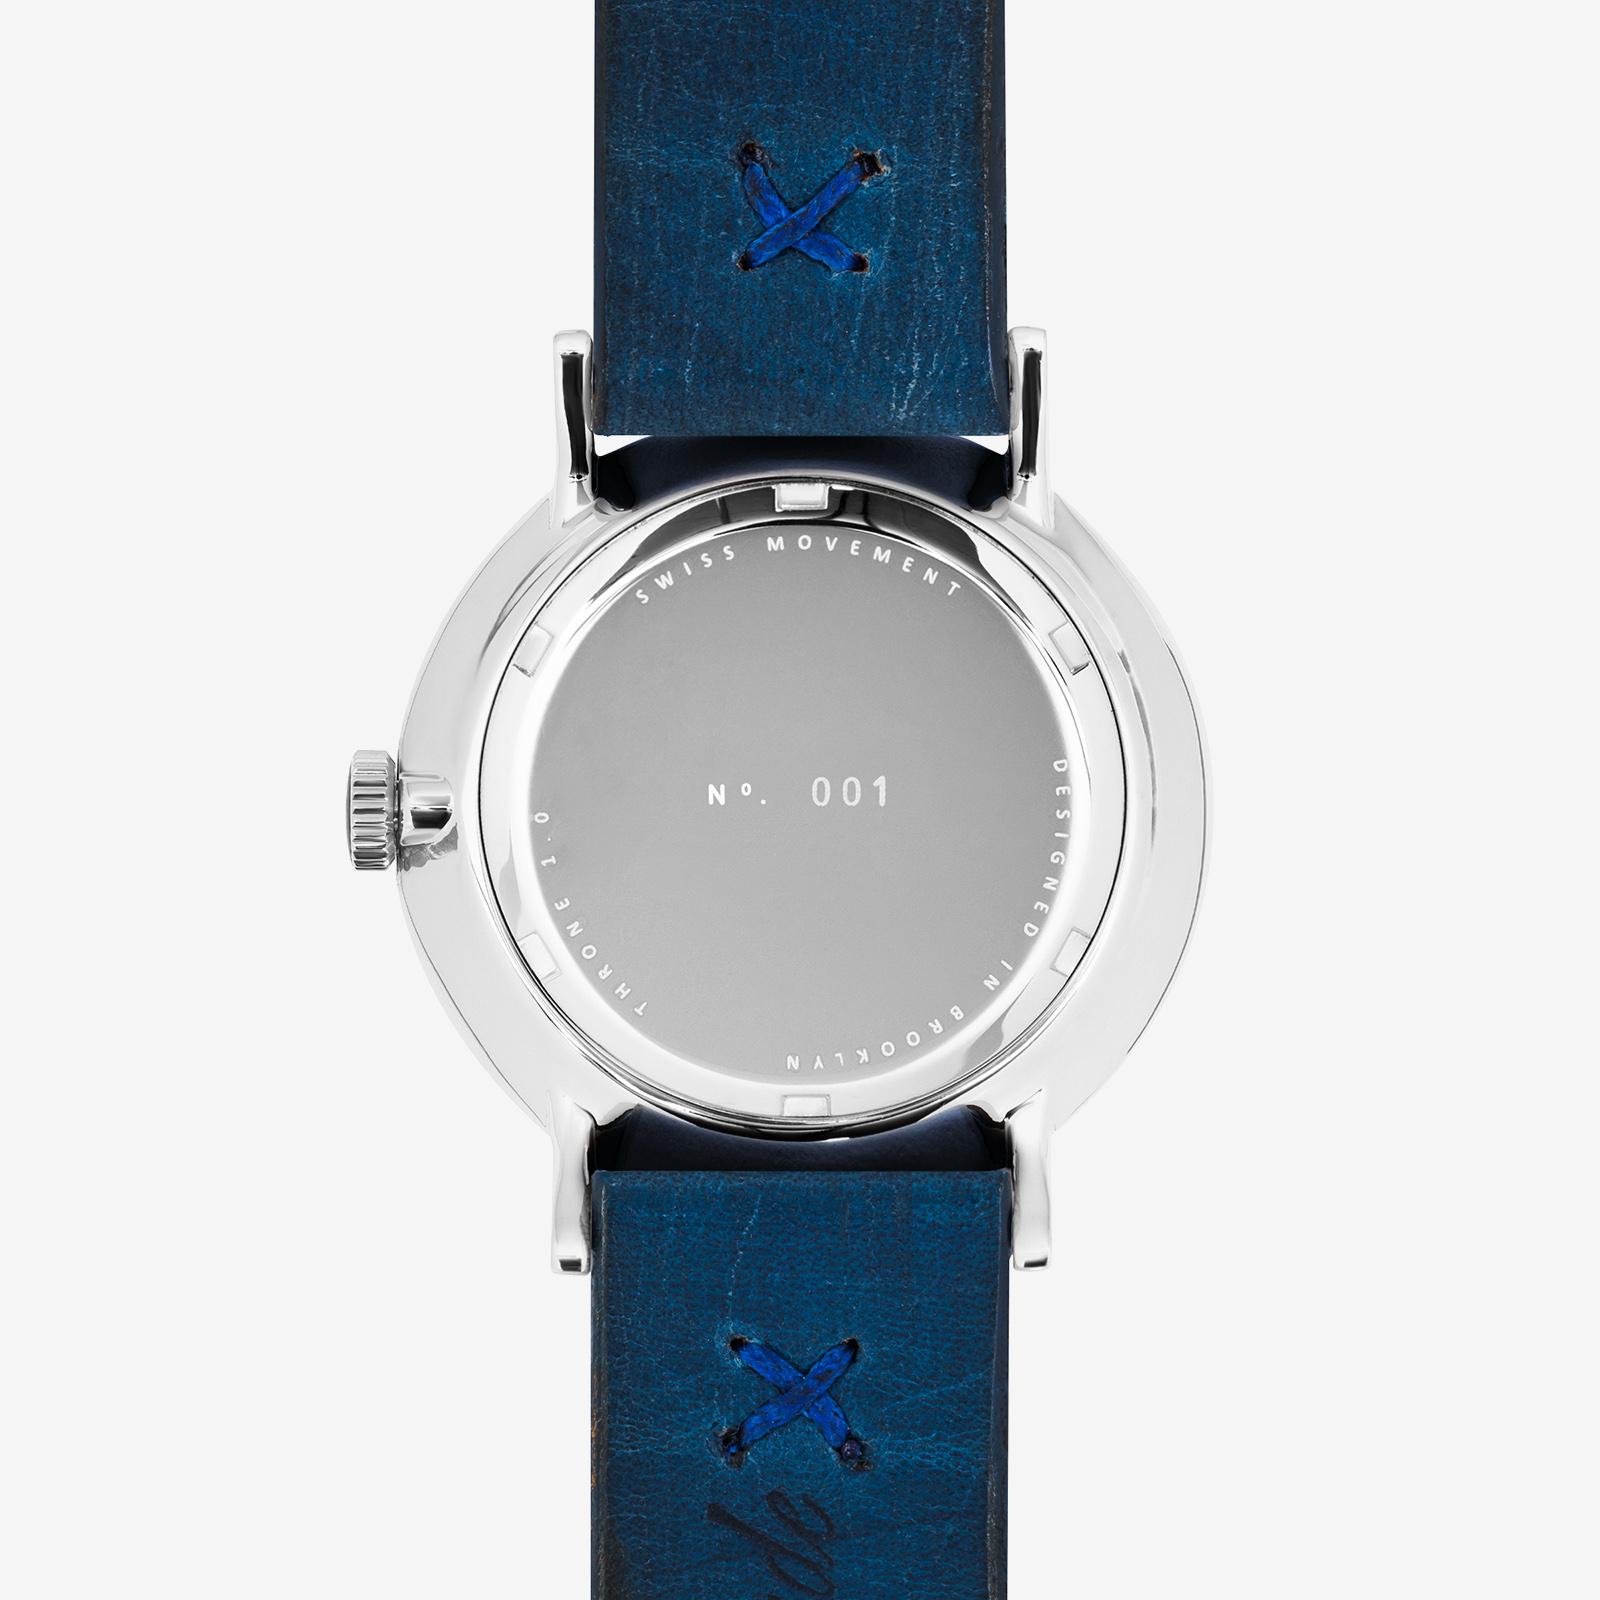 Watch back shot product image